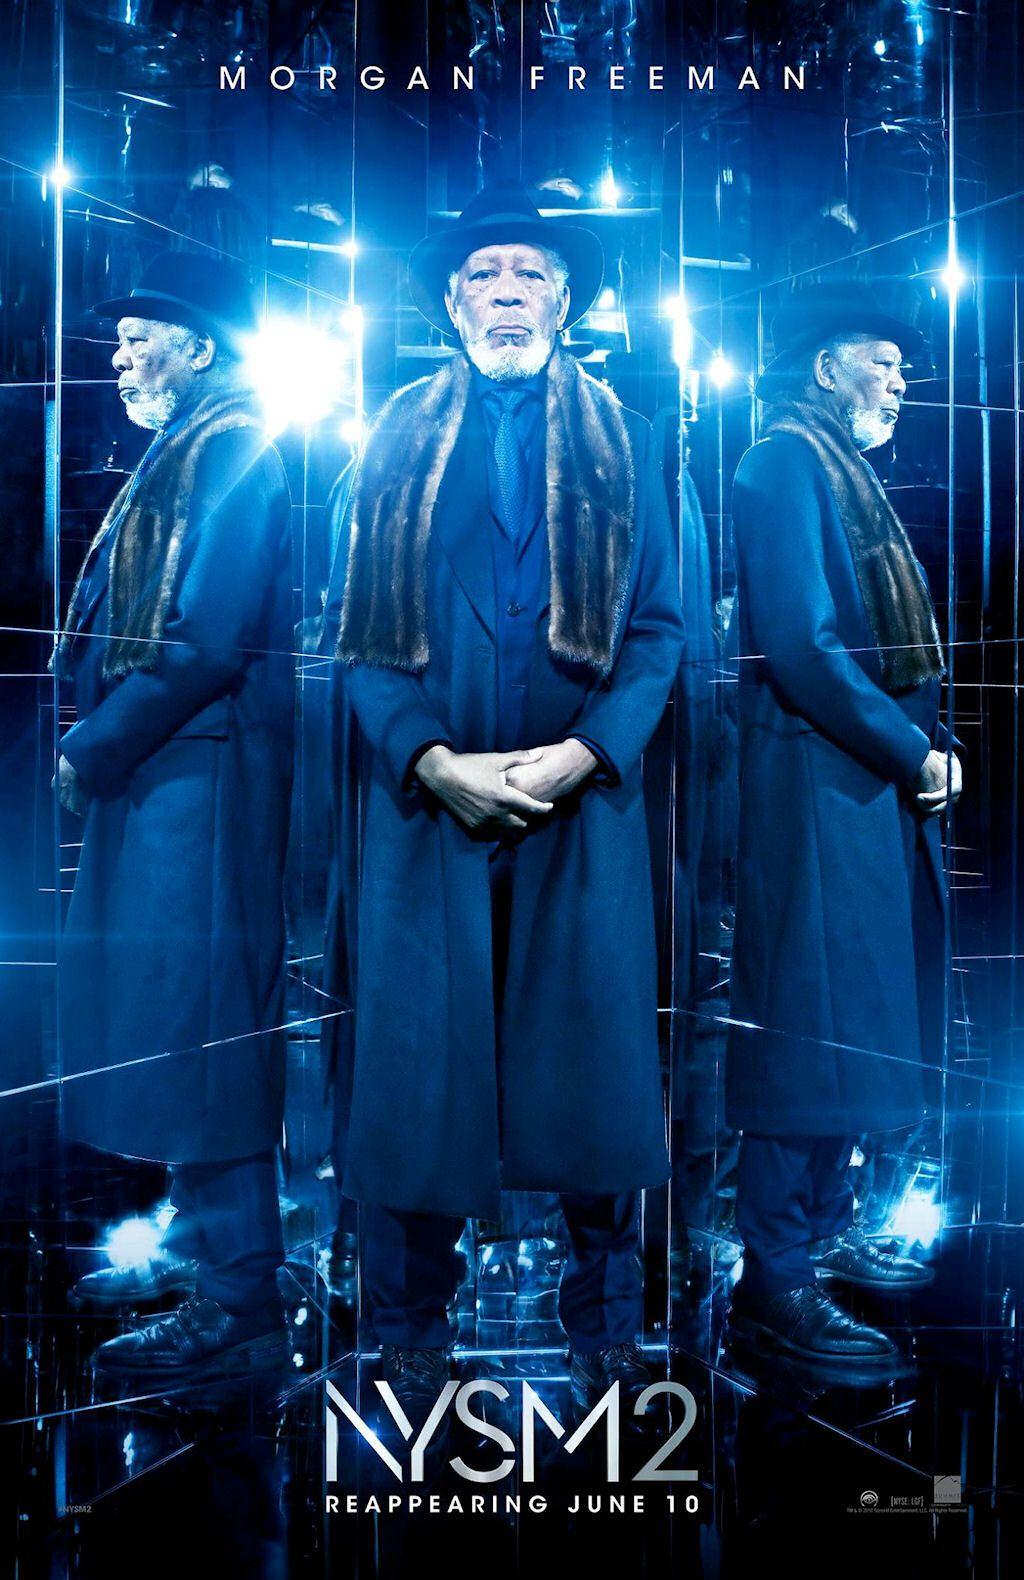 NOW YOU SEE ME 2 movie poster No.2 w/ Morgan Freeman